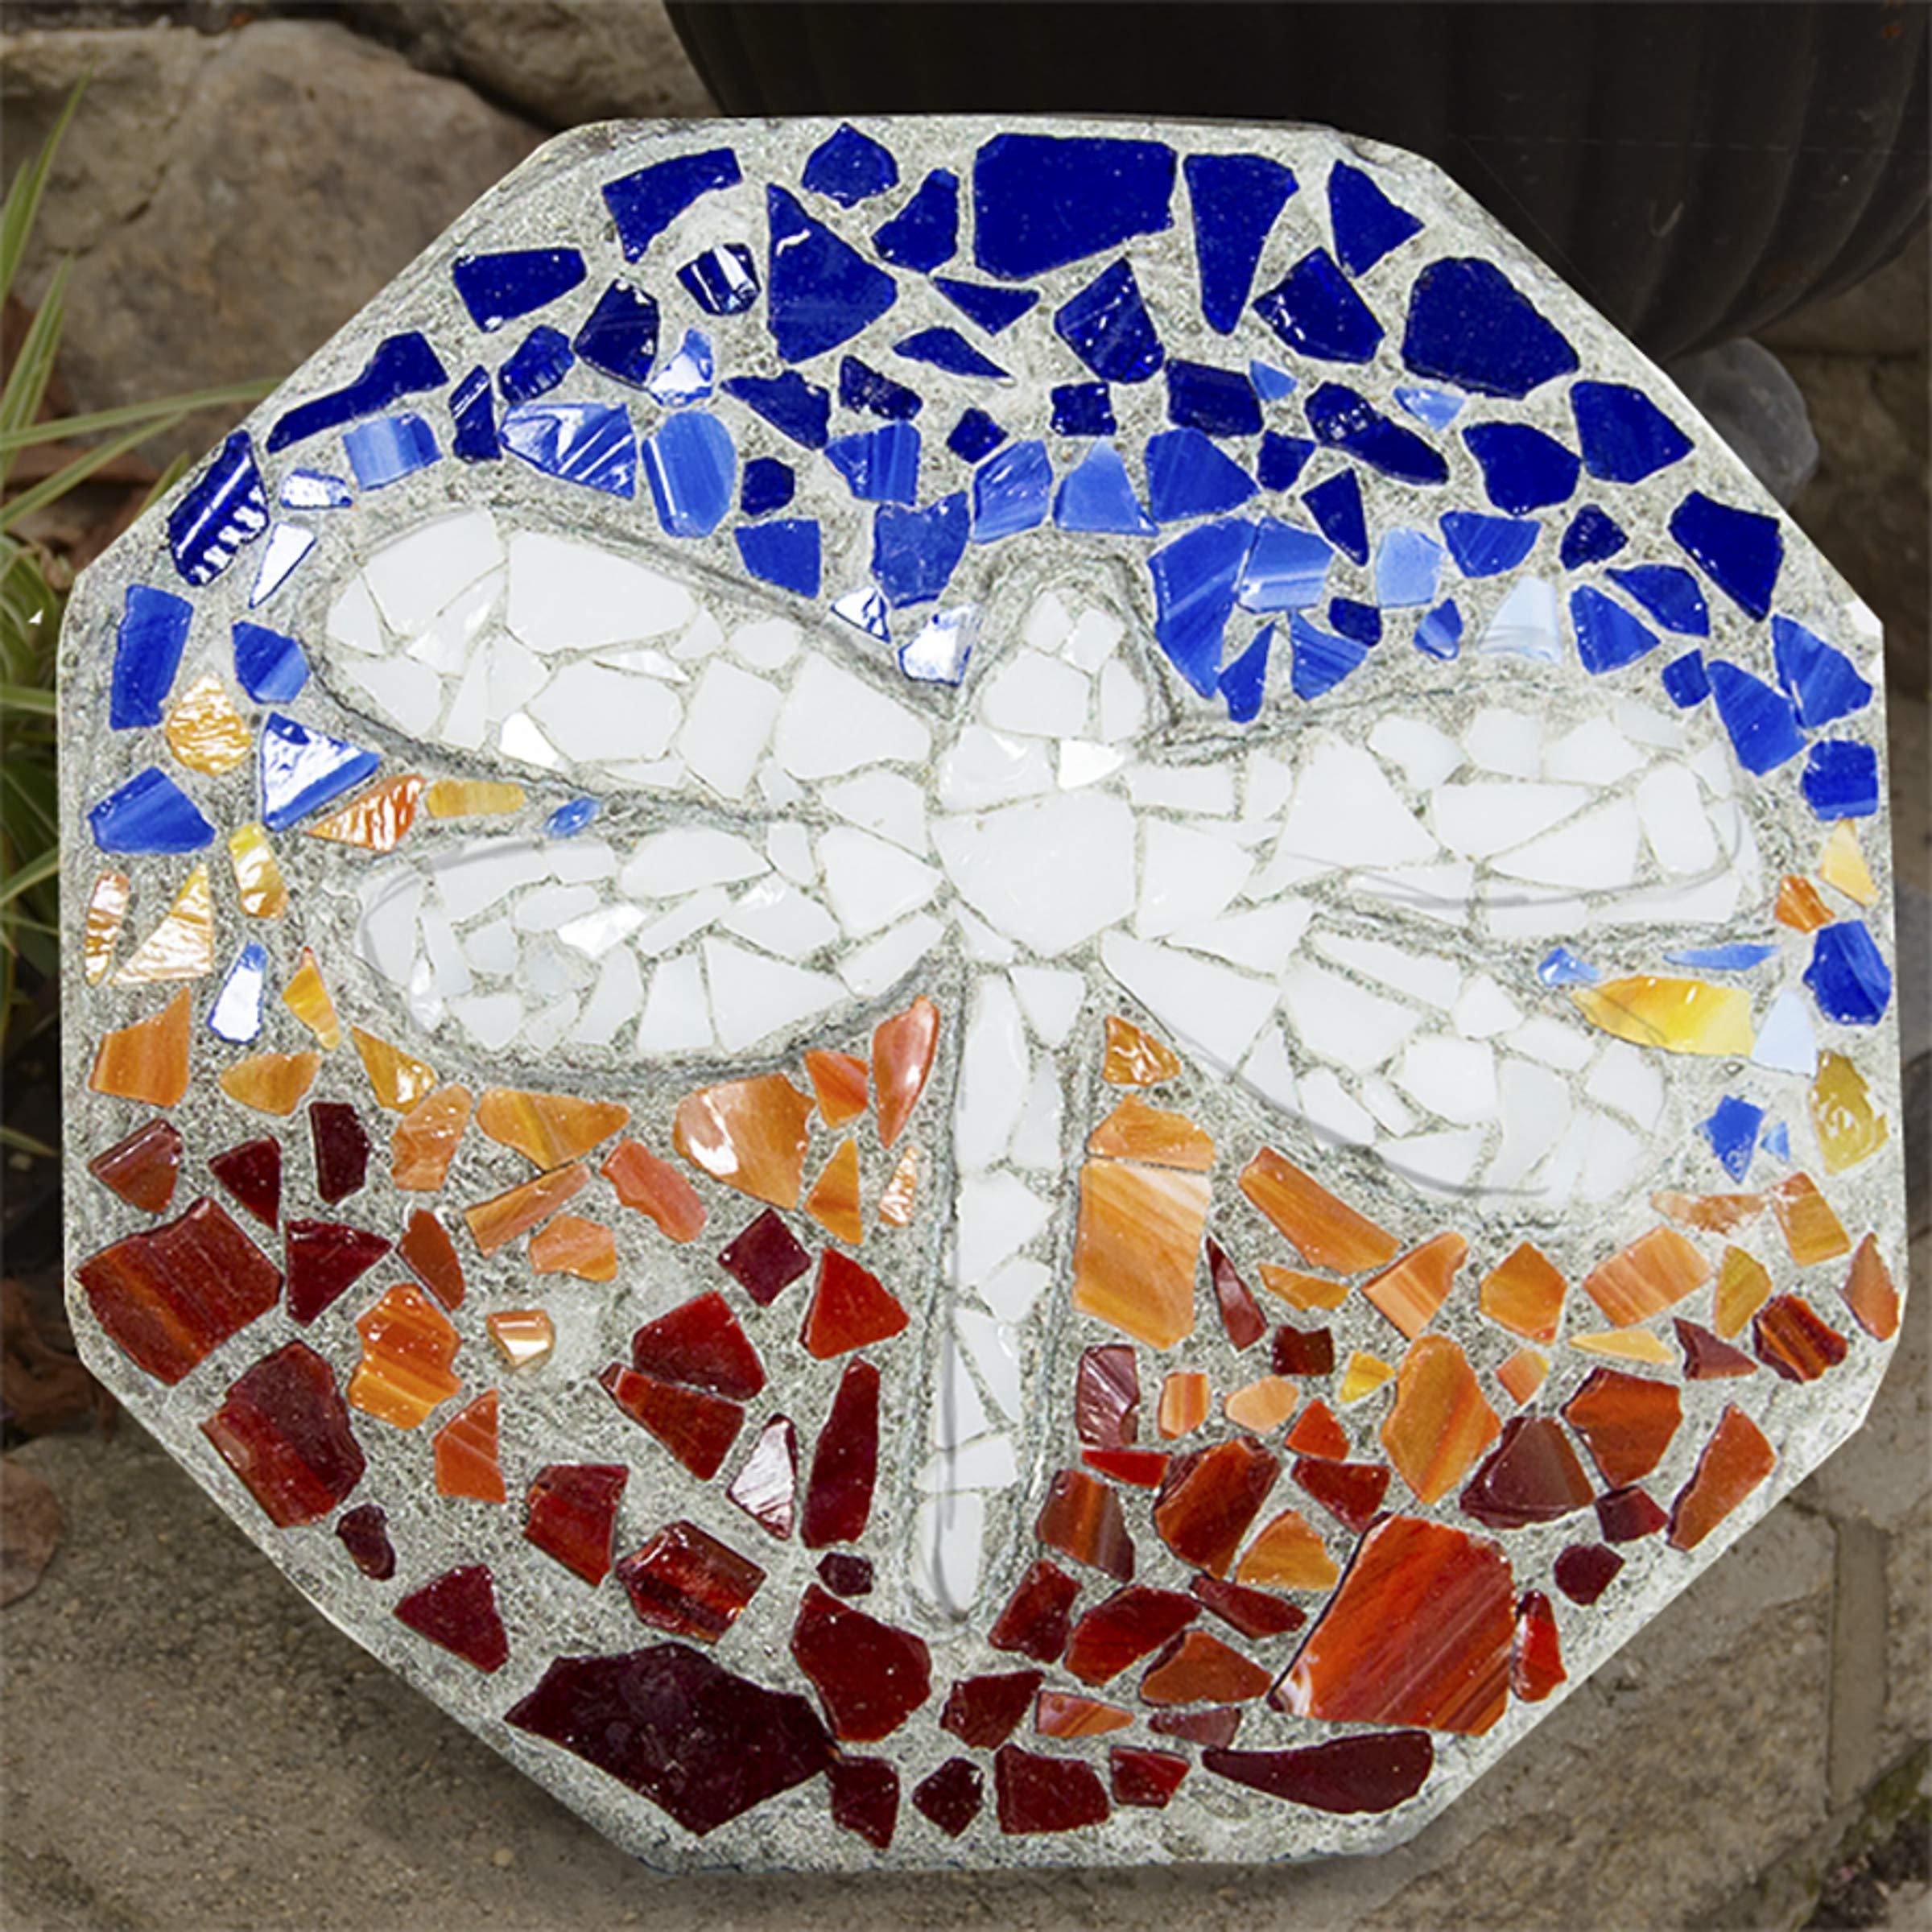 Milestones Mosaic Stepping Stone Kit, Makes a 12-Inch Stone by Milestones